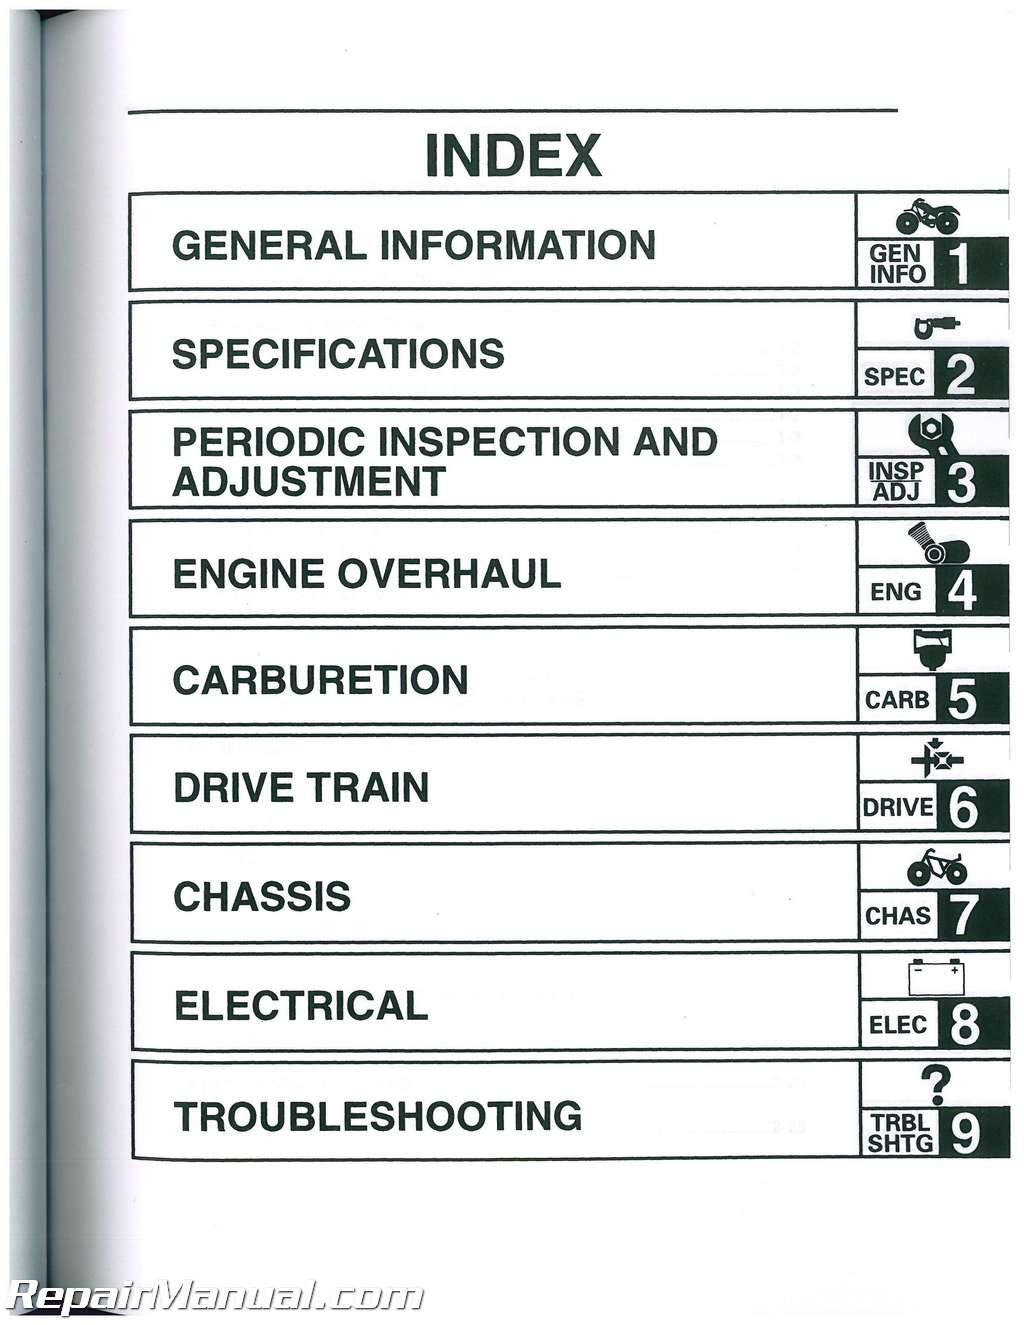 2001 yamaha wolverine 350 service manual